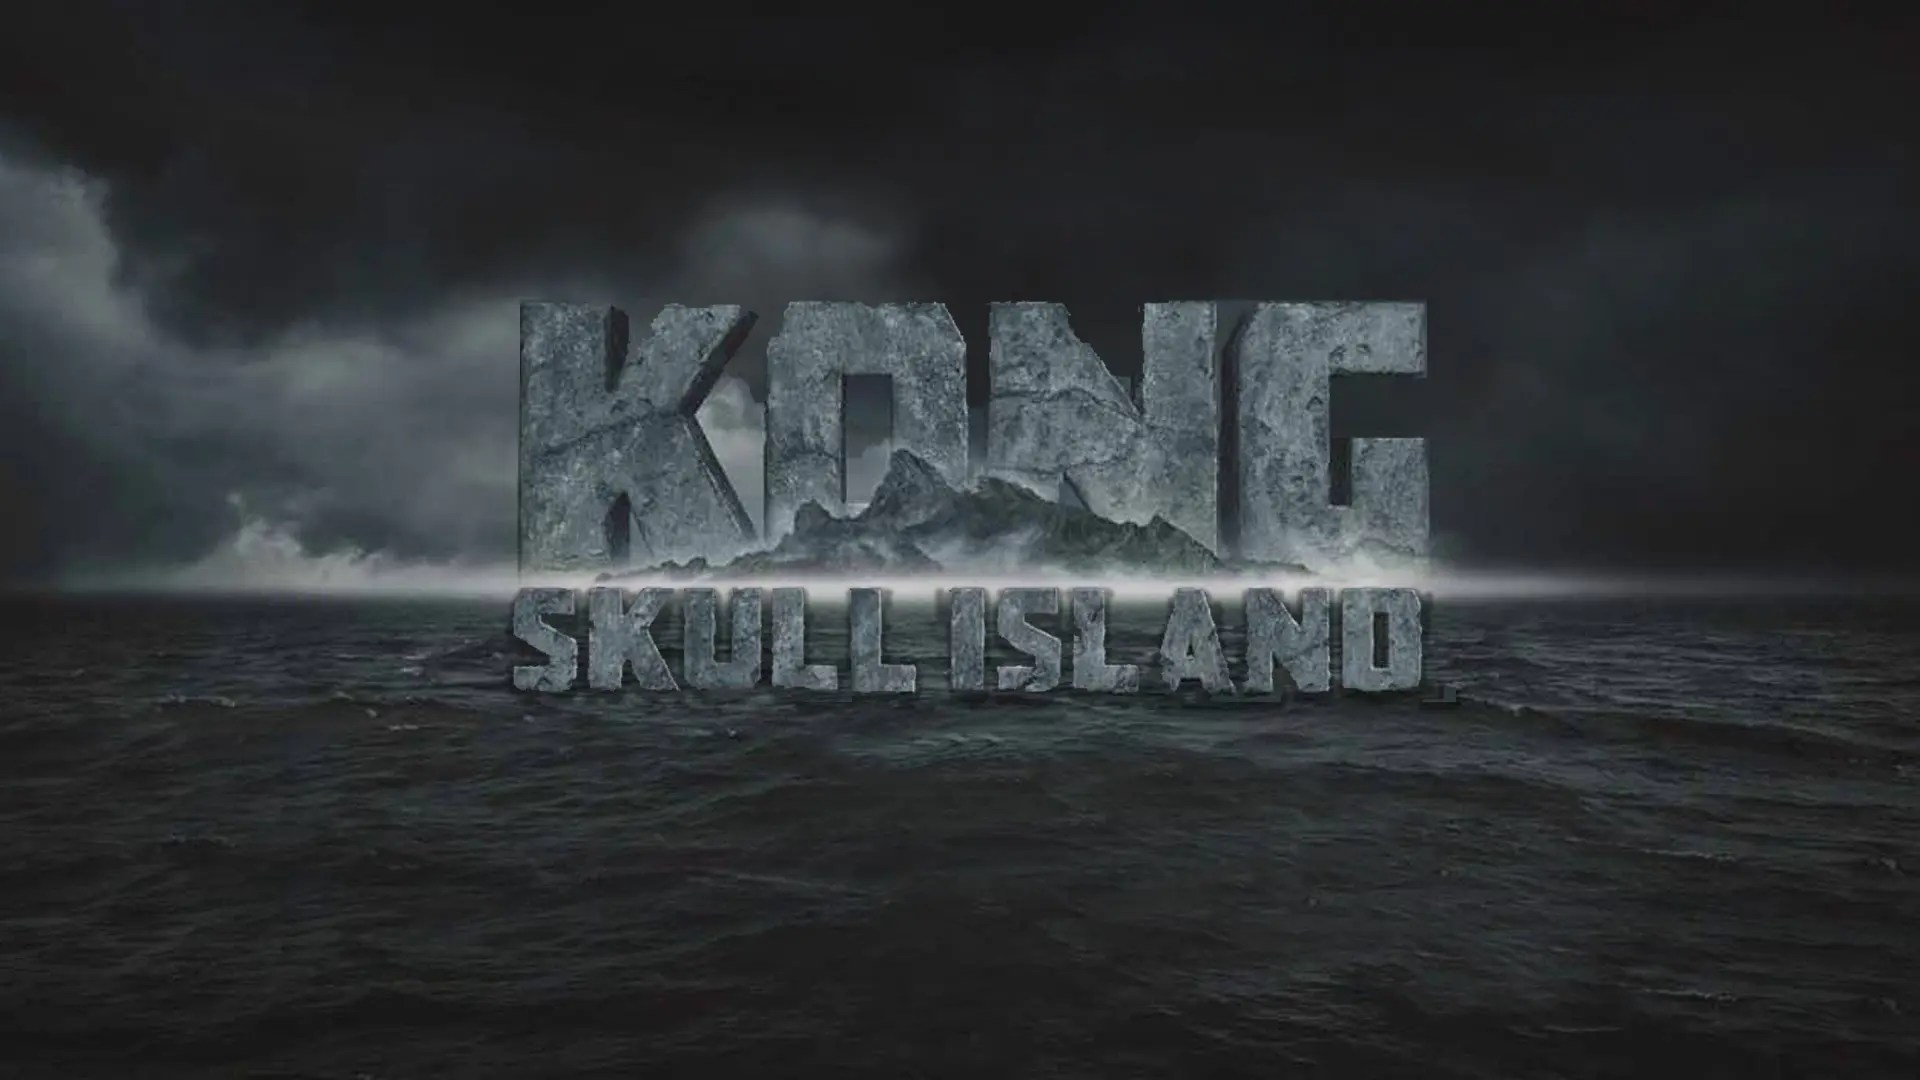 Godzilla Wallpaper Hd 1920x1080 Kong Skull Island Trailer Proves Monsters Do Exist